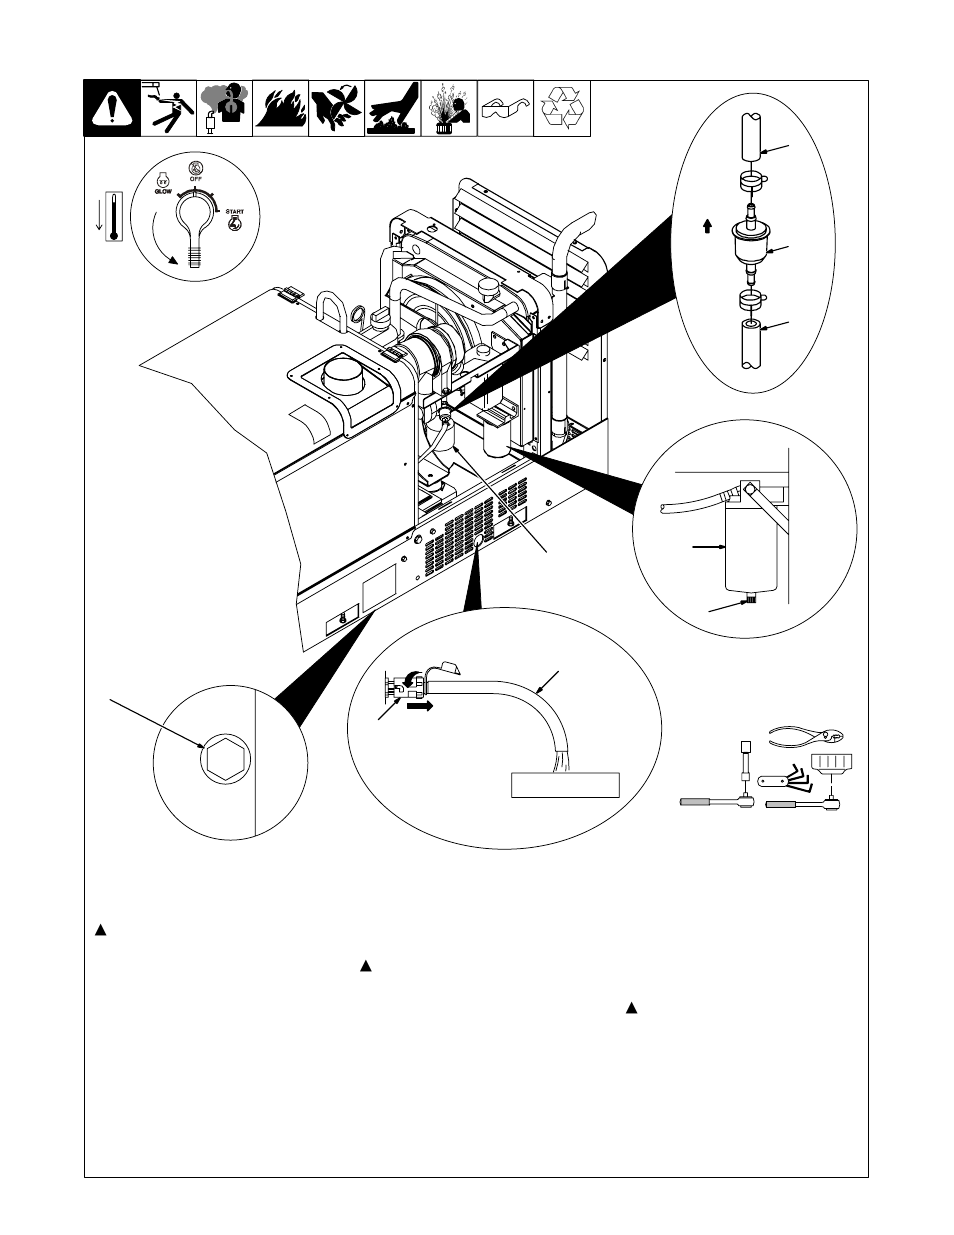 pro control manual ebook on